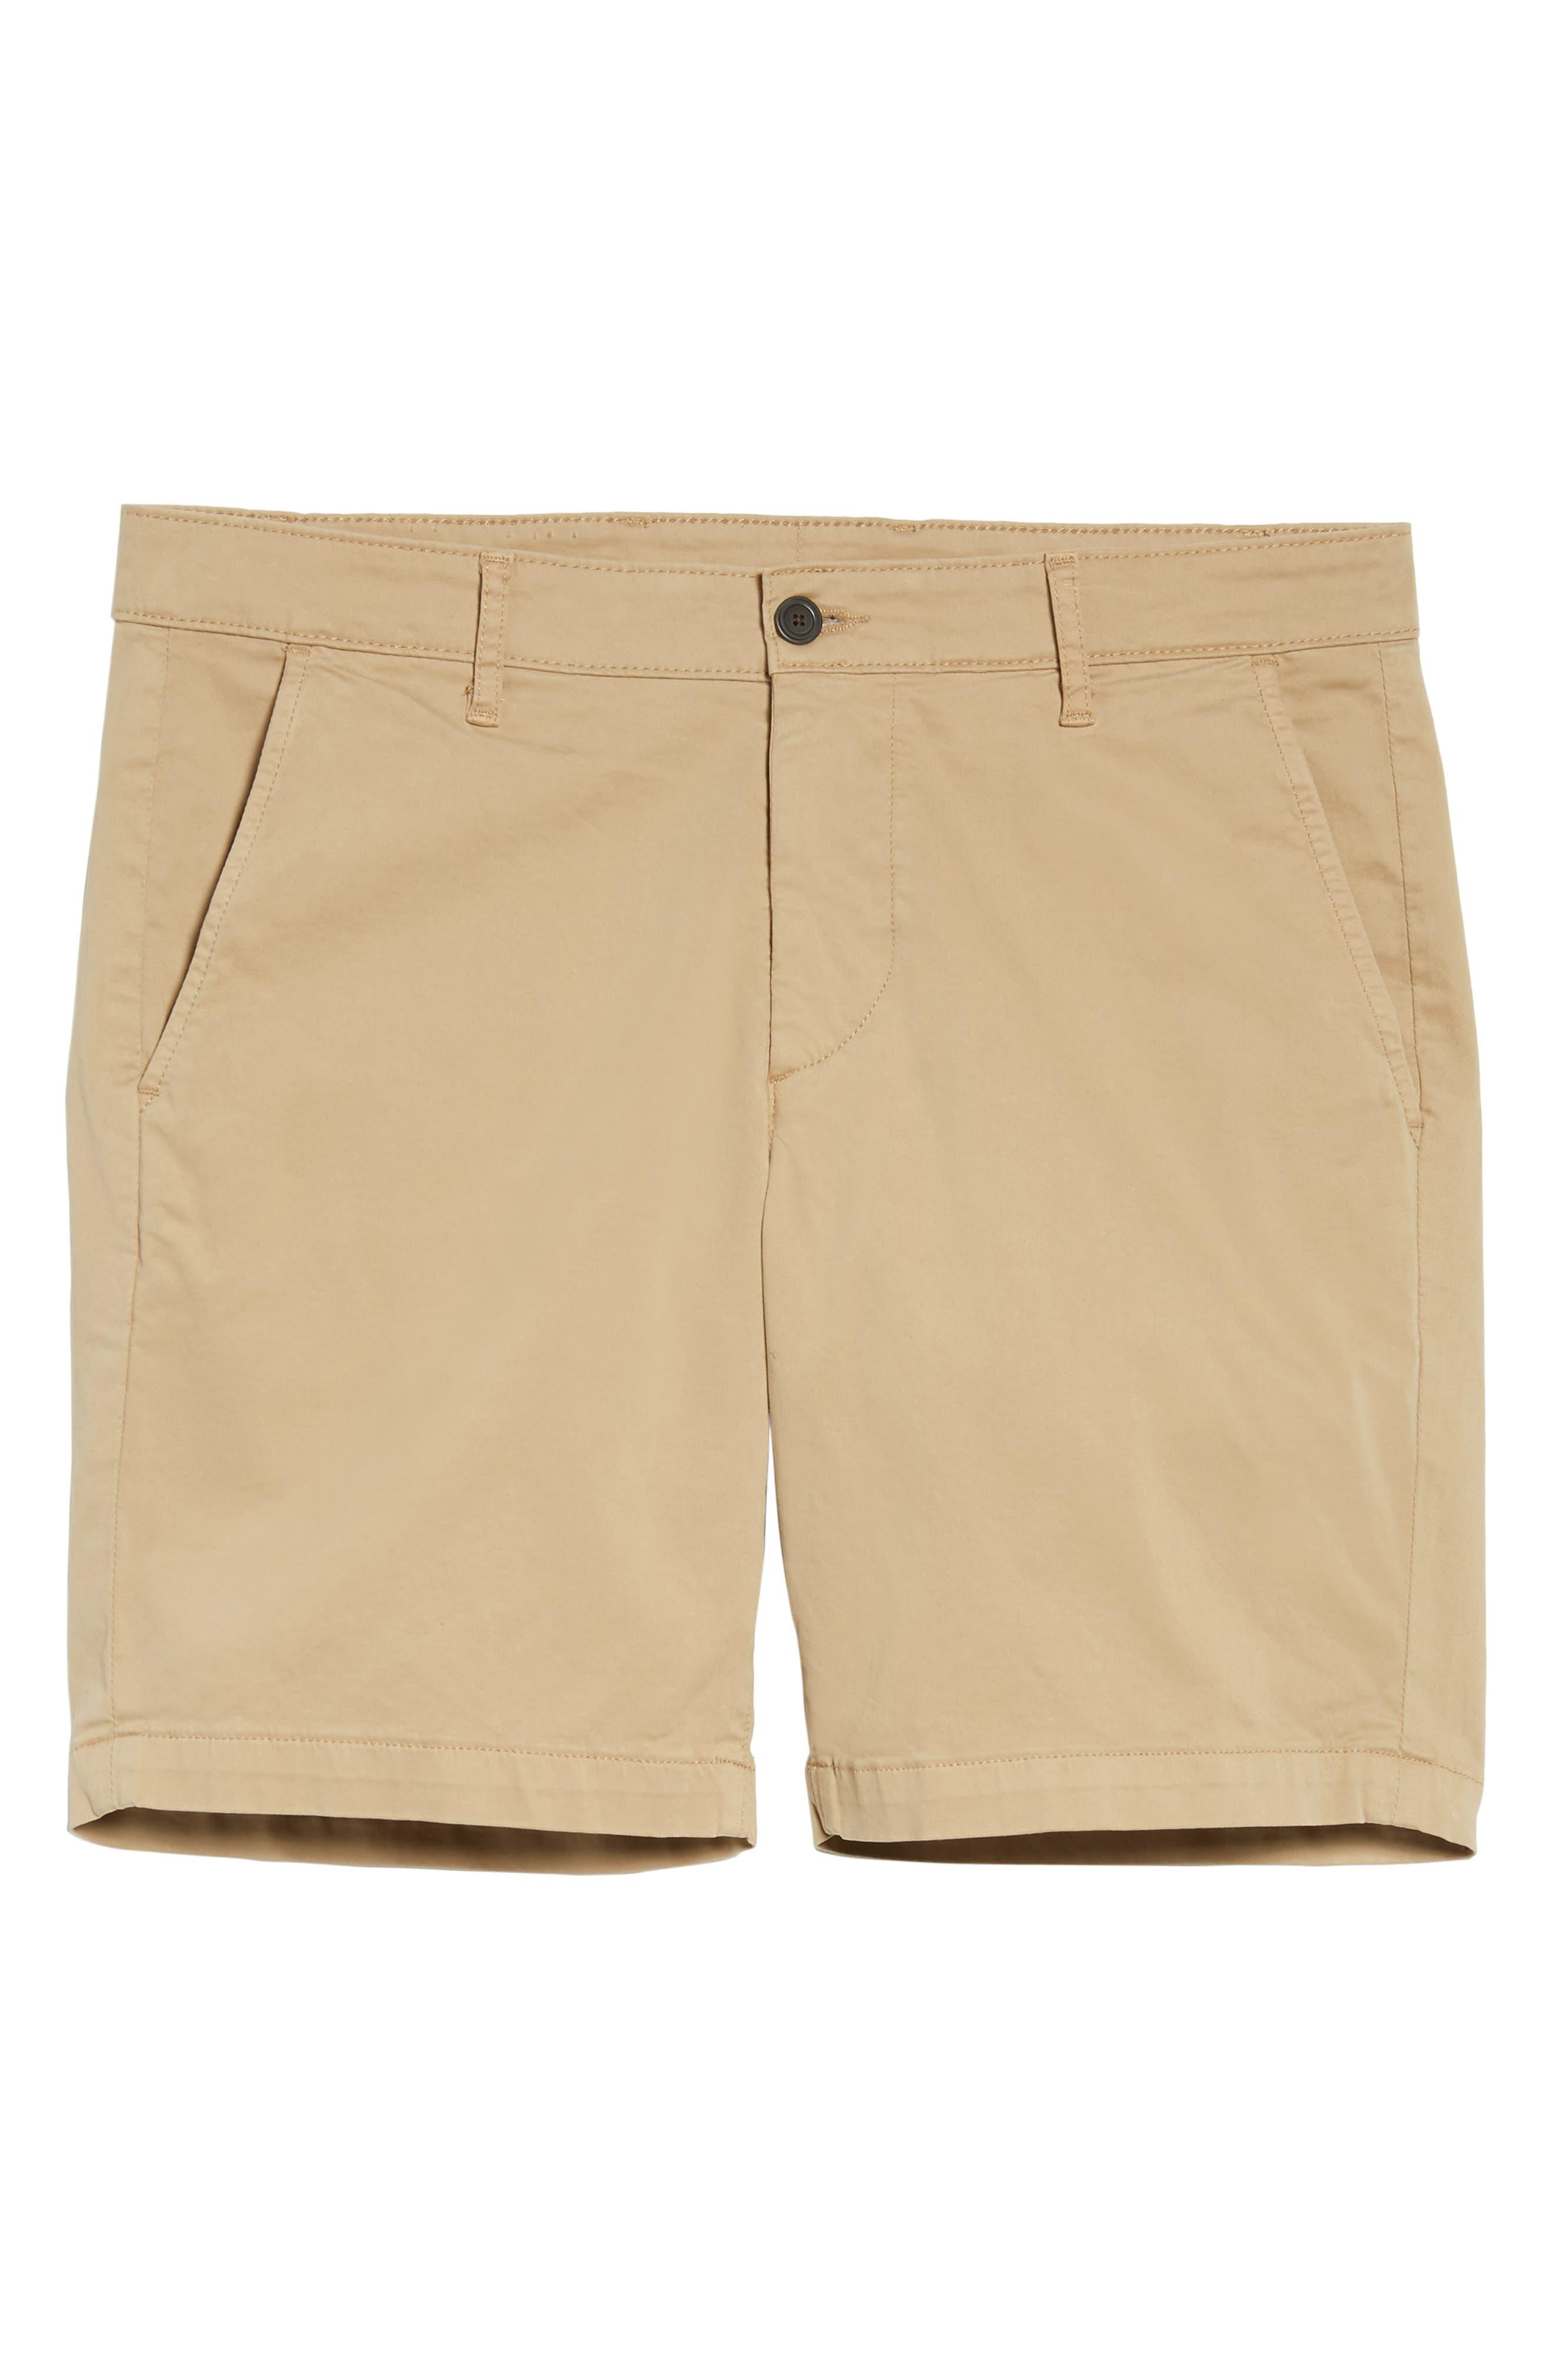 Wanderer Modern Slim Fit Shorts,                             Alternate thumbnail 6, color,                             244